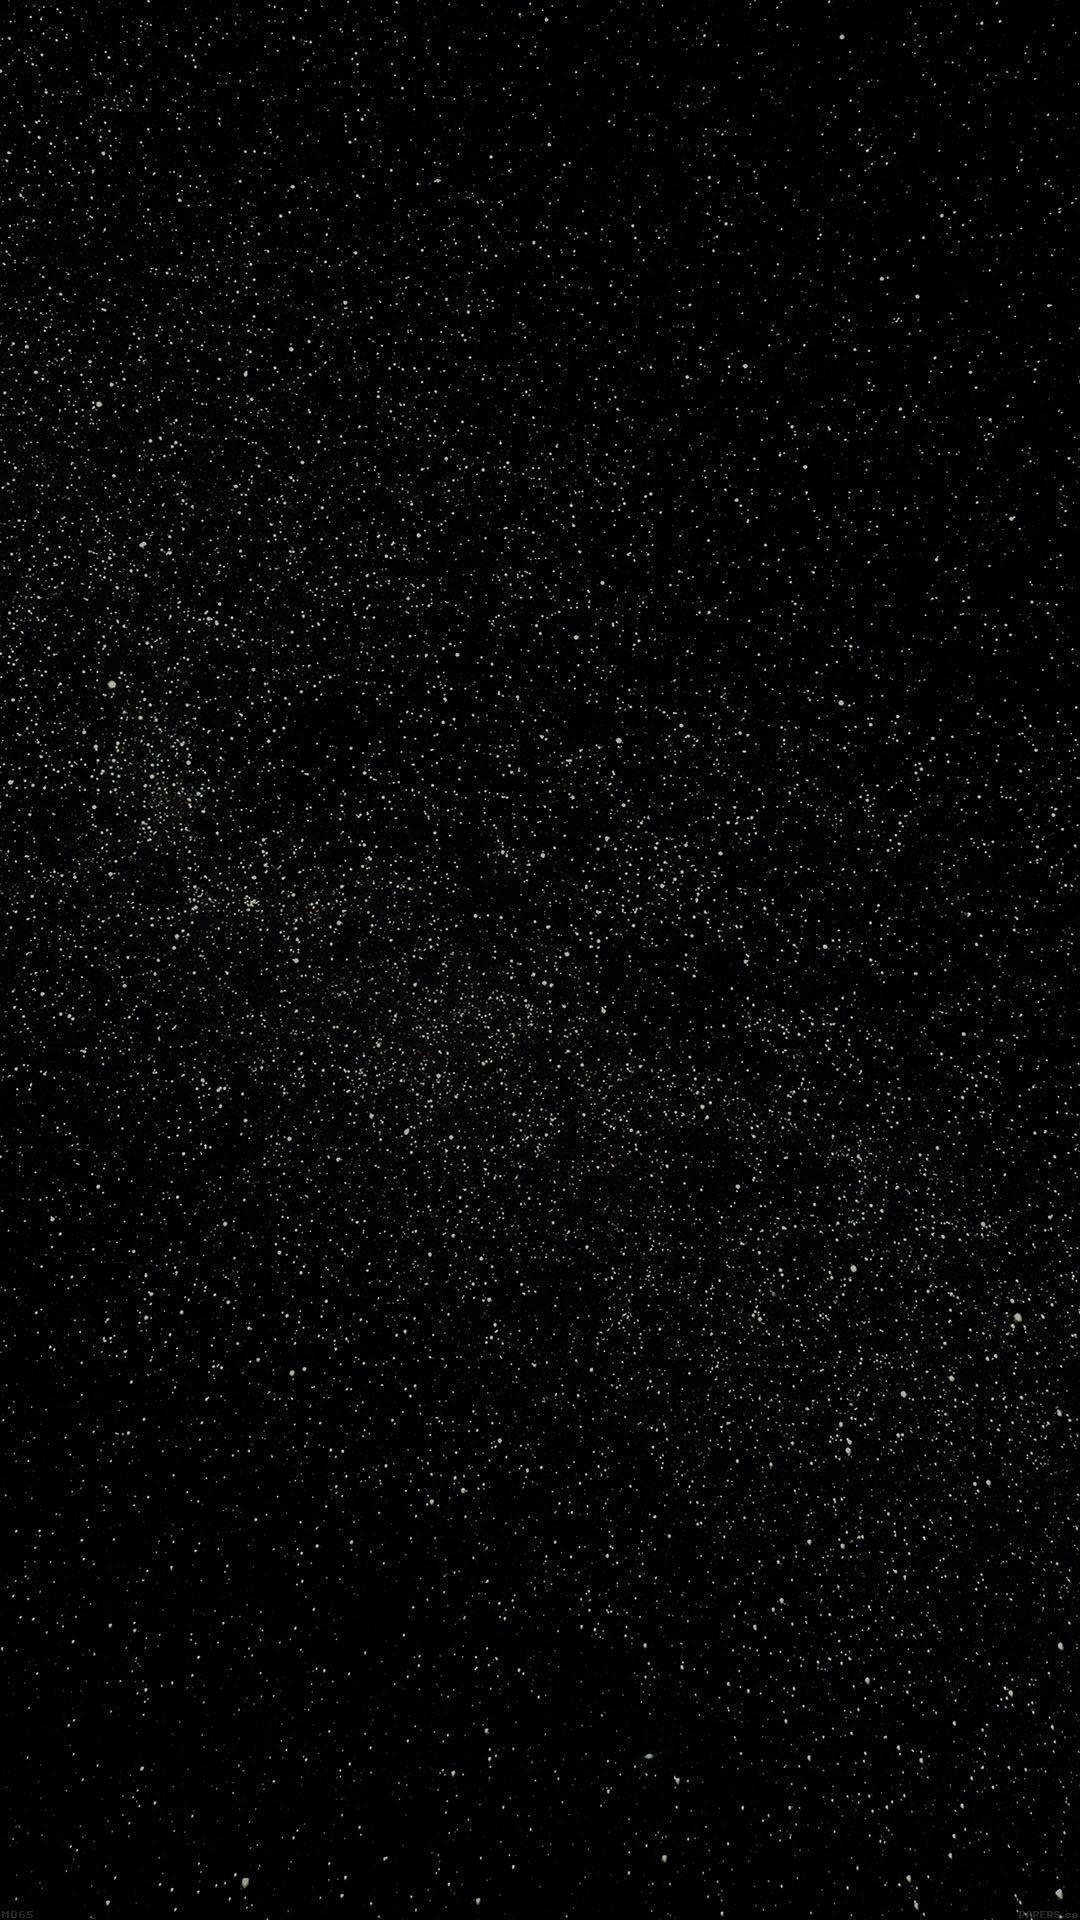 Hd 4k Iphone Black Wallpapers Wallpaper Cave